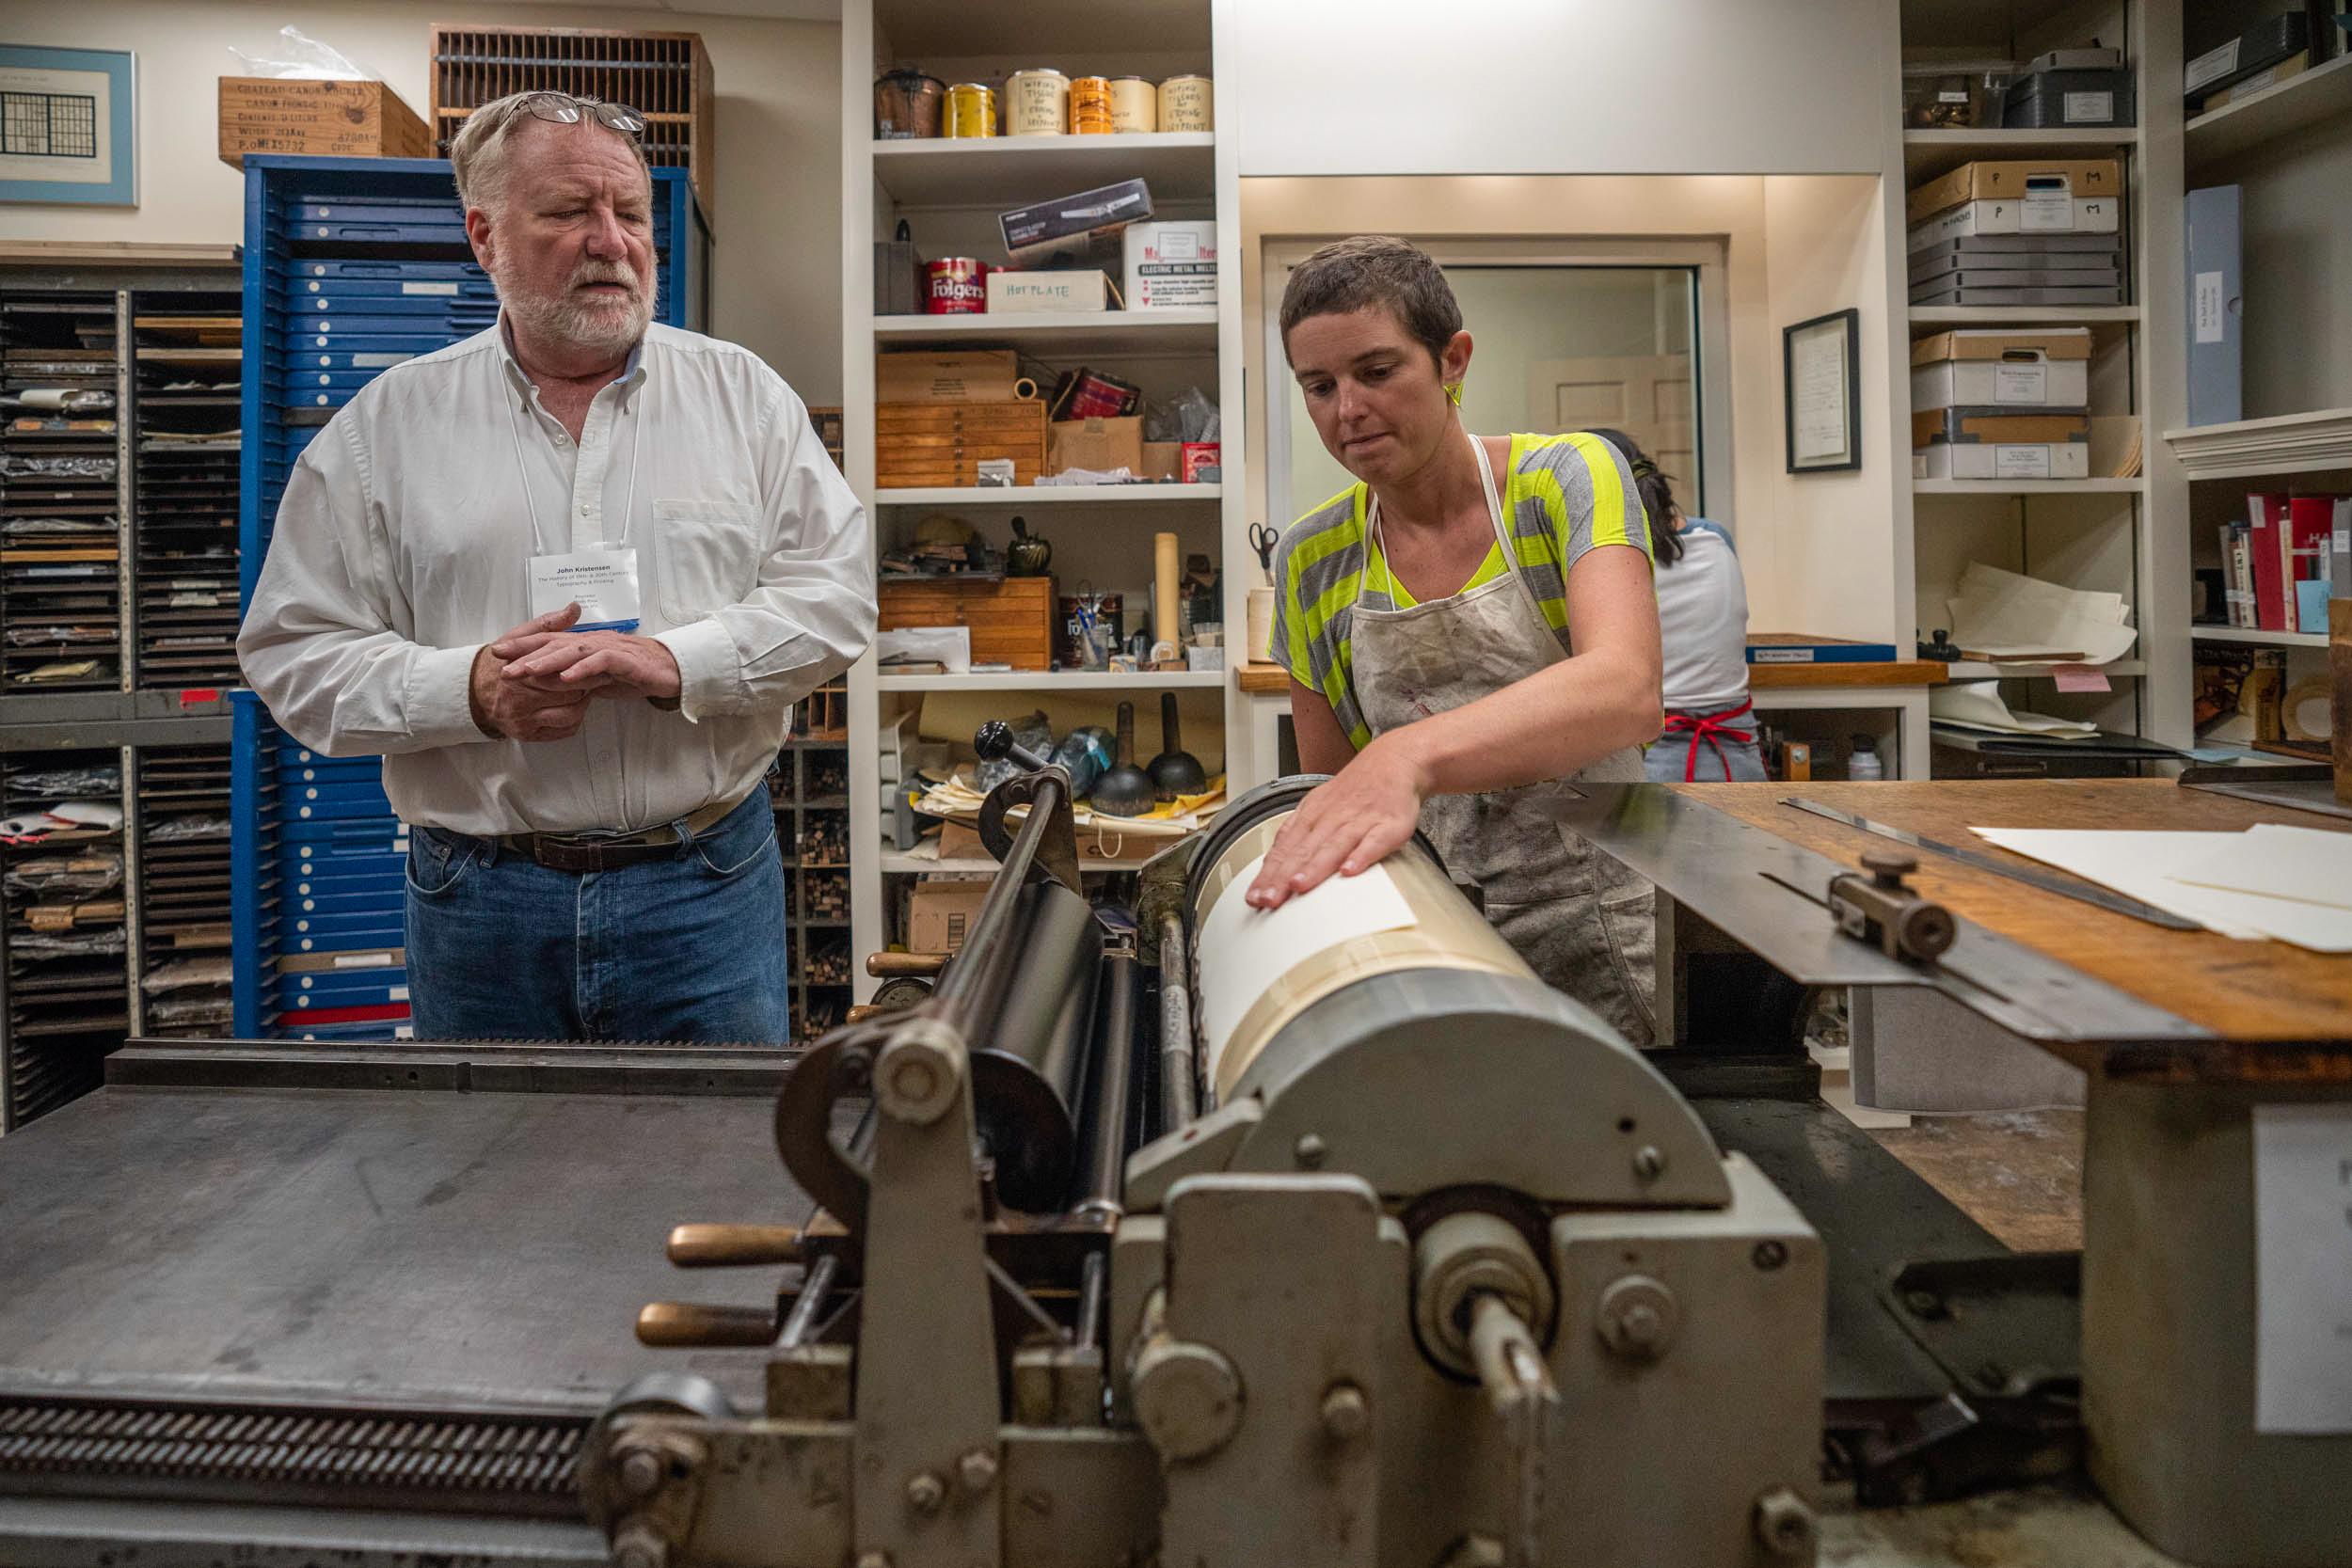 Instructor John Kristensen watches as student Meghan Forbes works the Vandercook proof press.